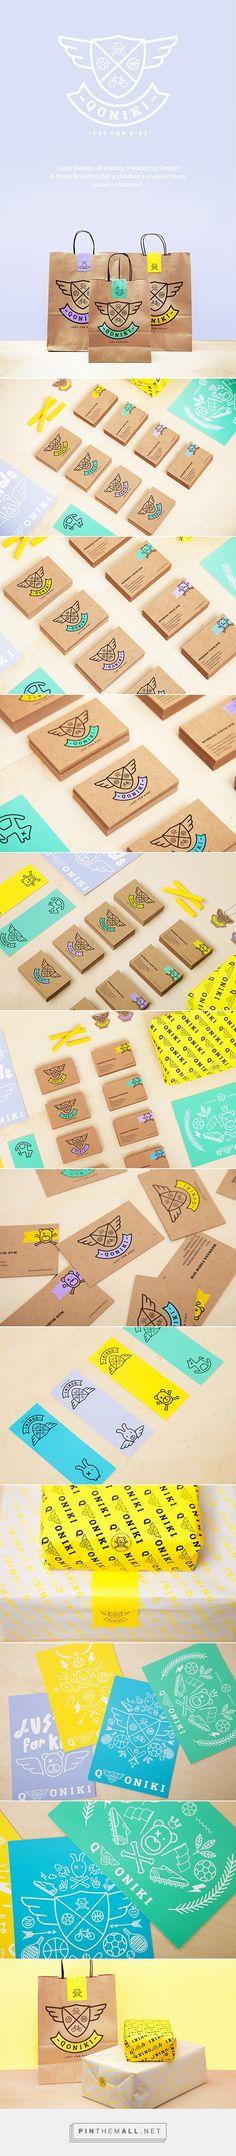 QONIKI Branding & Packaging Designed by Ipek Eris